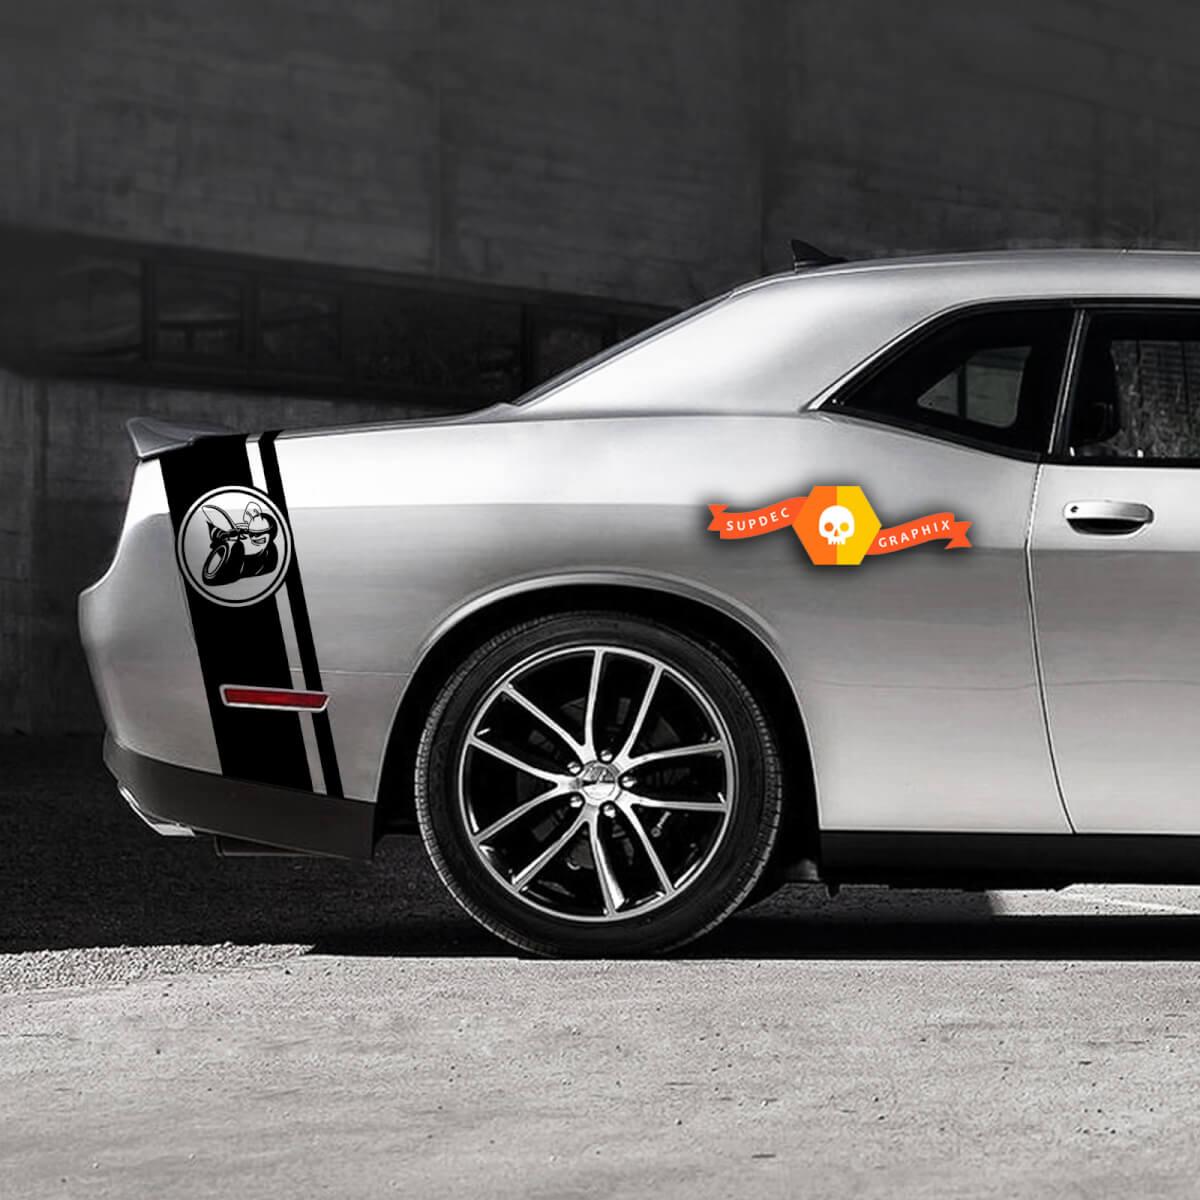 Dodge Challenger Sloped Super Bee Schwanzband Aufkleber Grafik passt zu Modellen